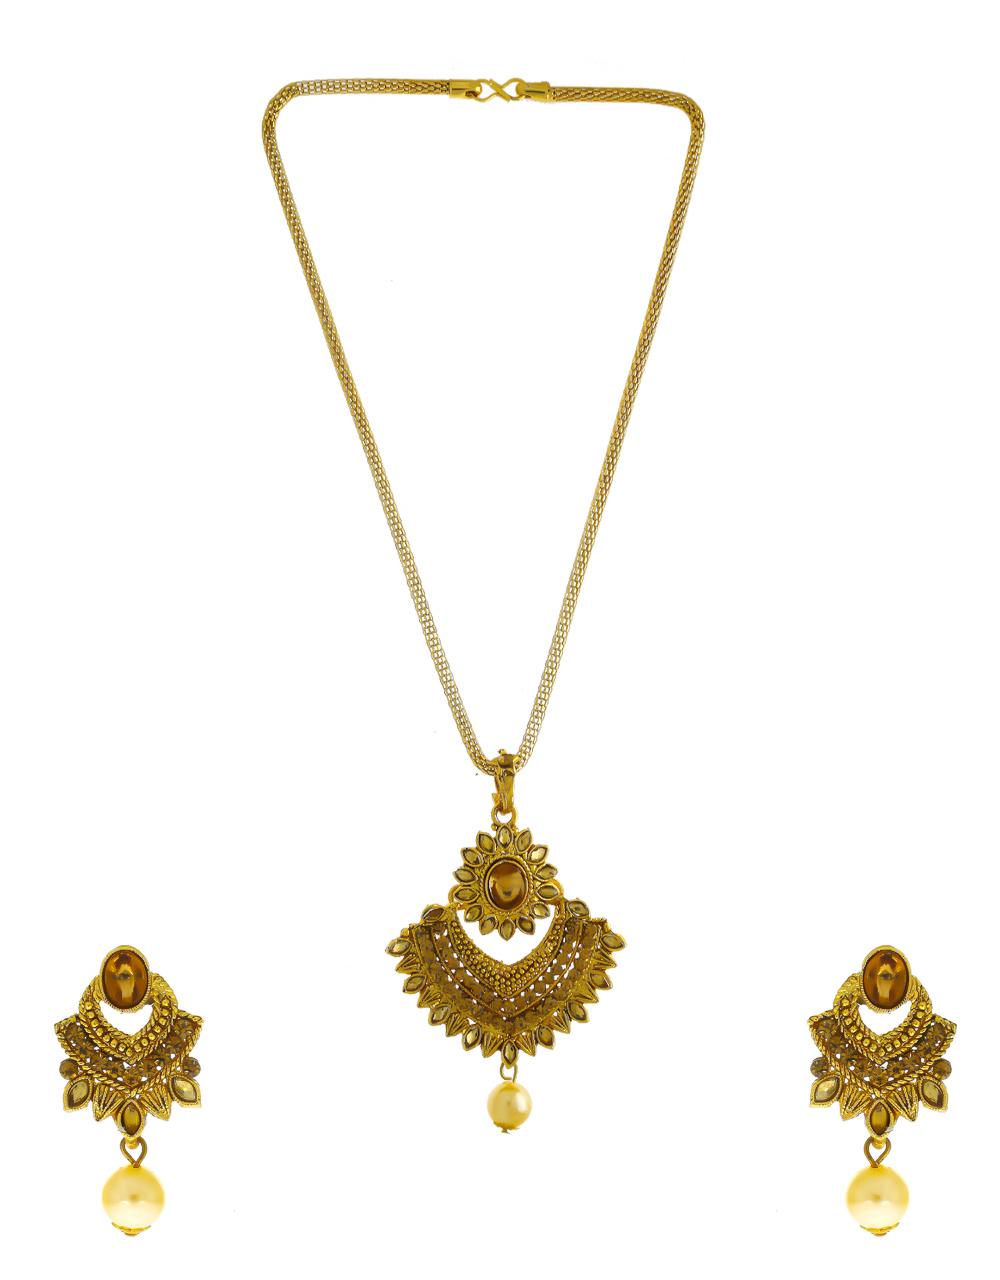 Floral Design Gold Finish Stunning Traditional Pendant Set